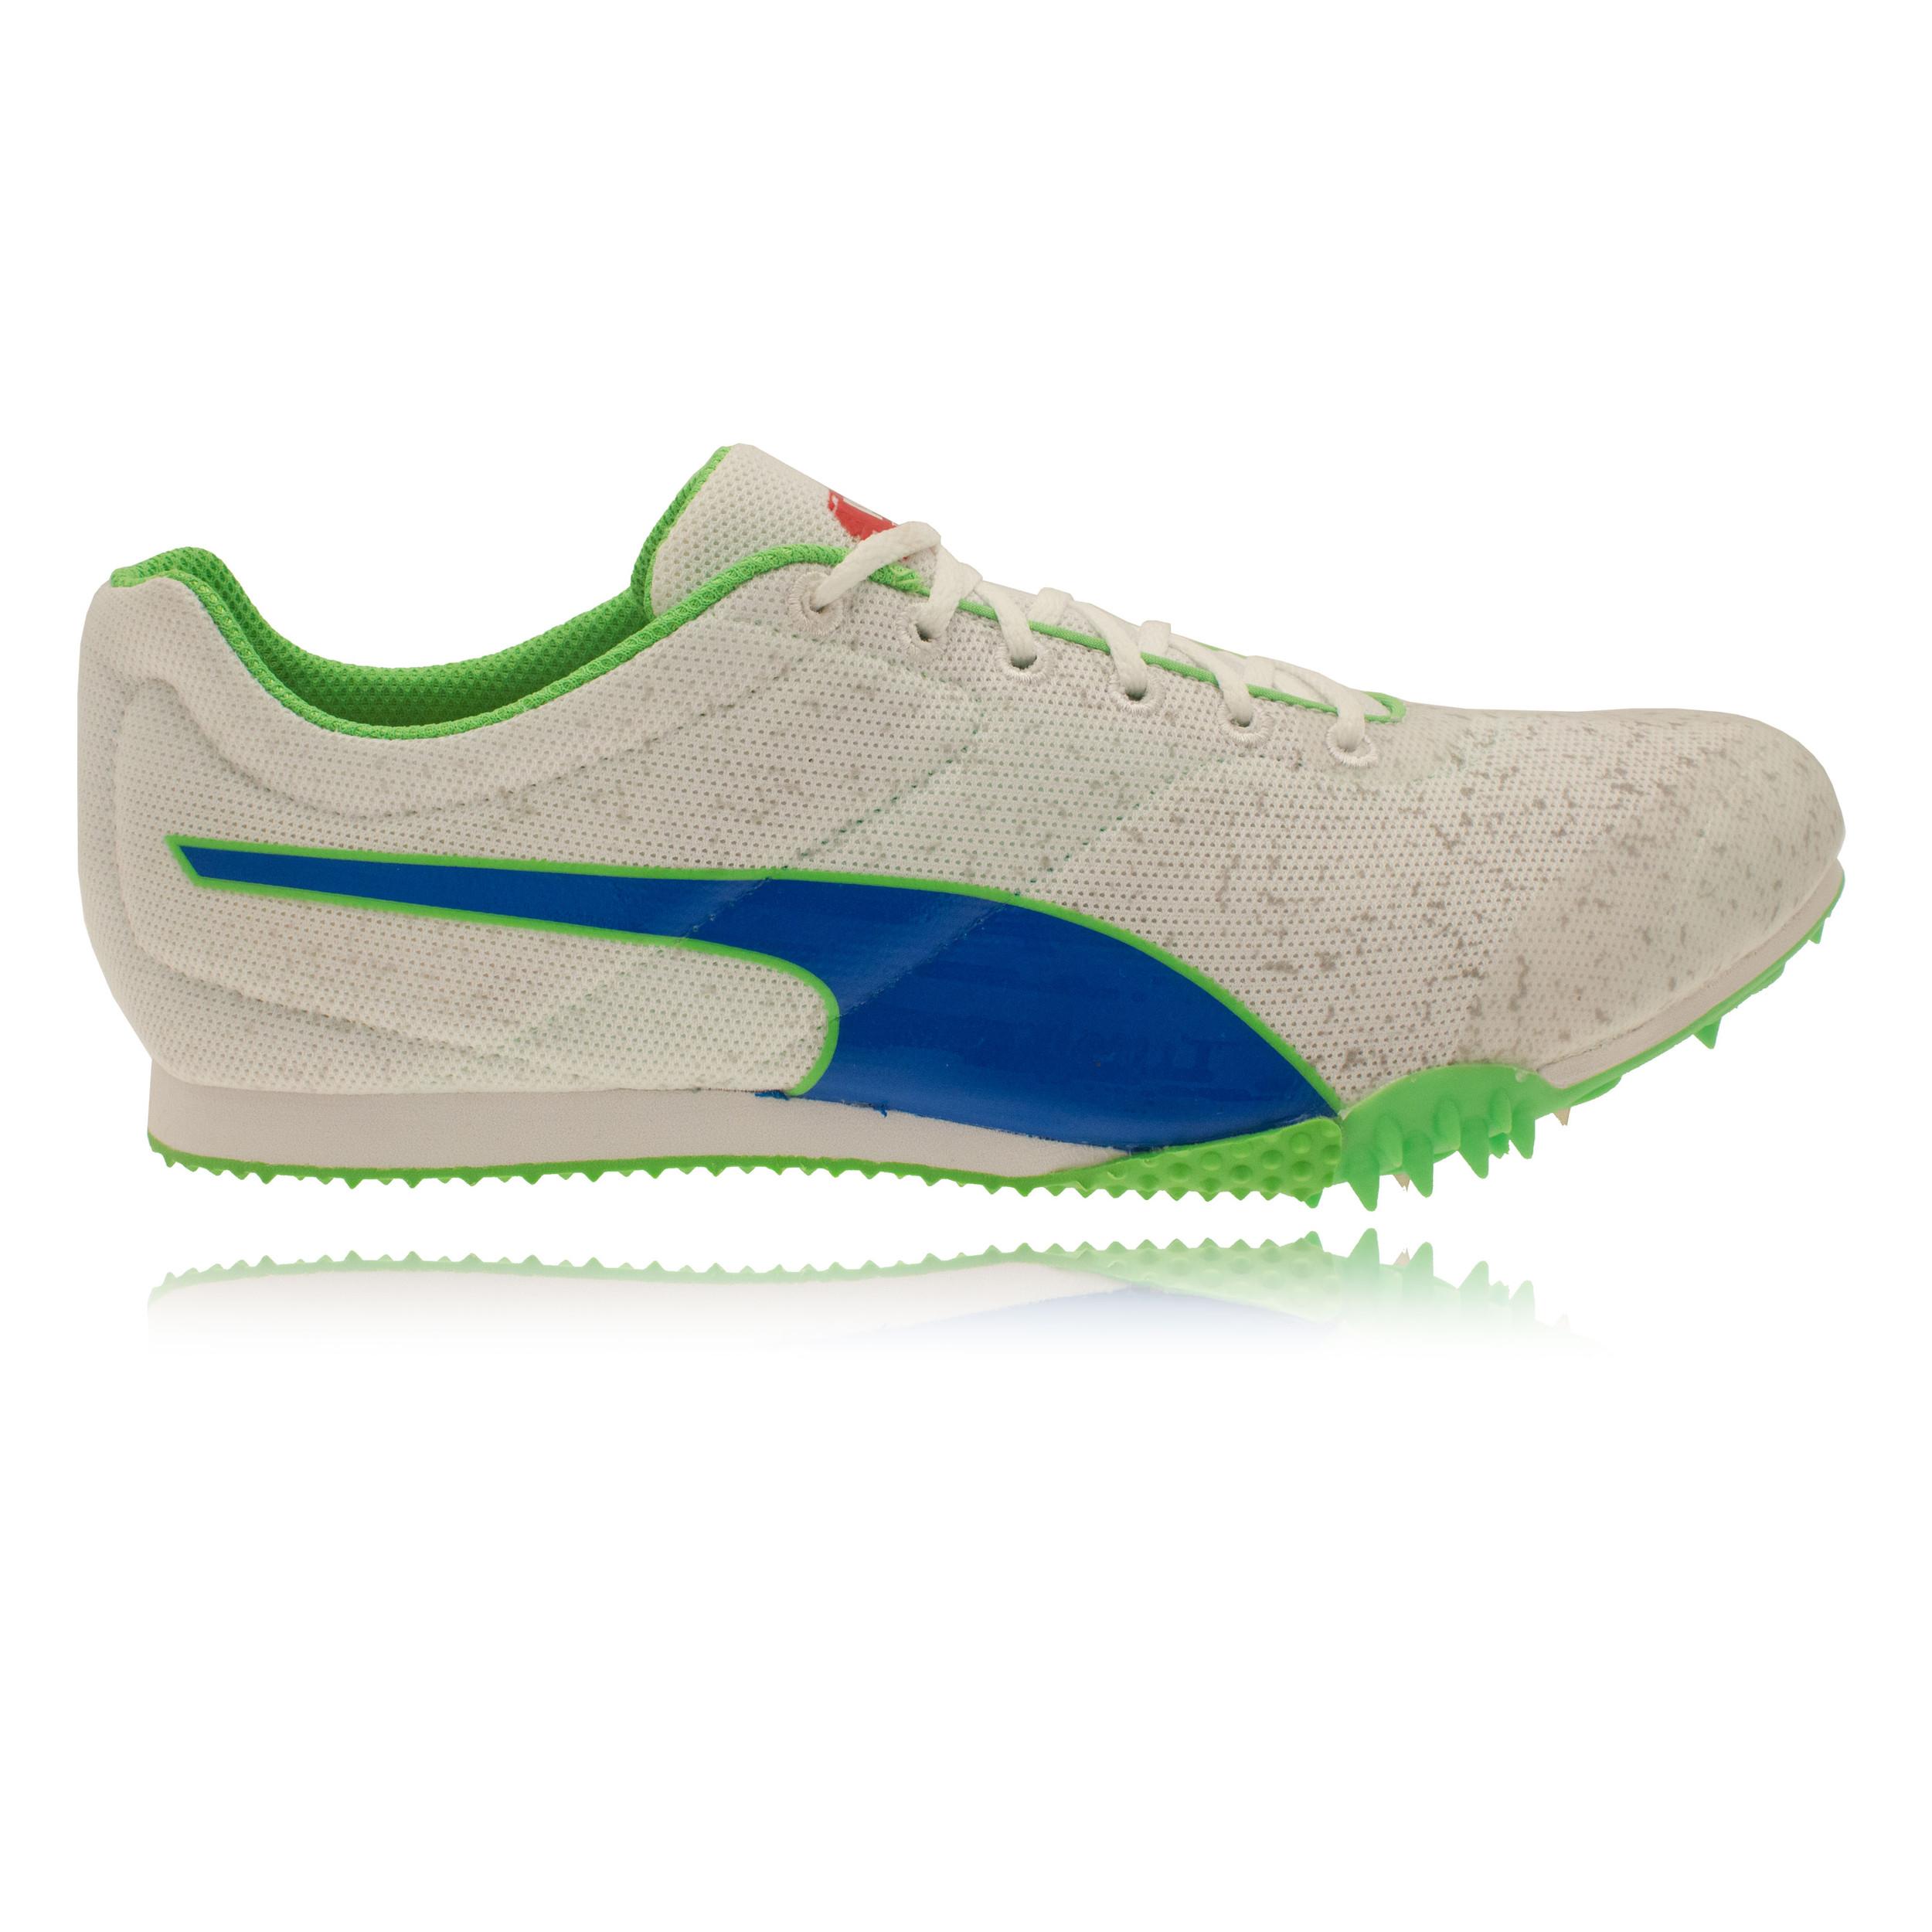 Details zu Puma TFX Sprint V3 Damen Laufen Spikes Spikeschuhe Sport Schuhe Mehrfarbig